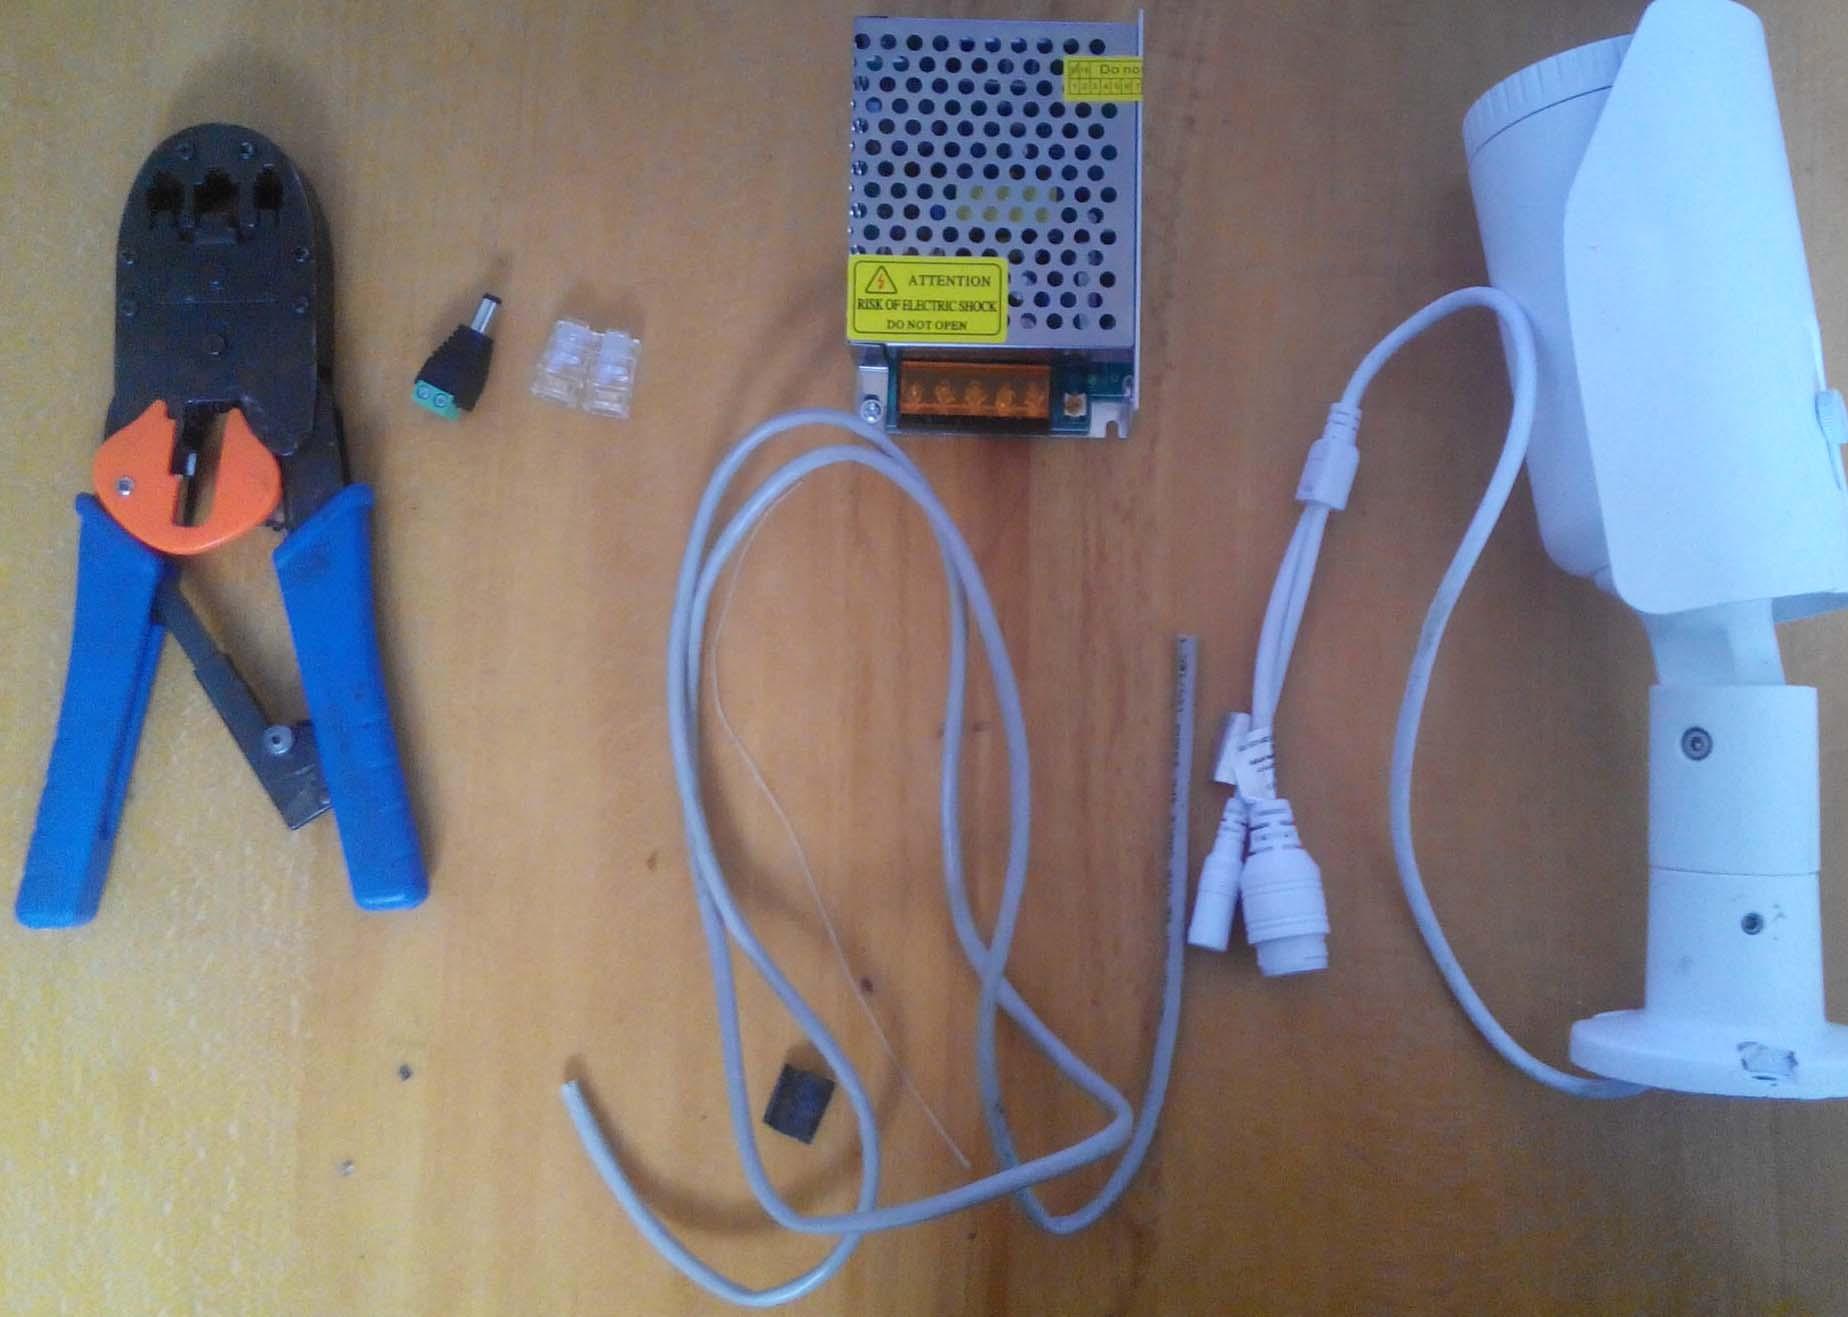 схема подключения rj-45 по 4 провода